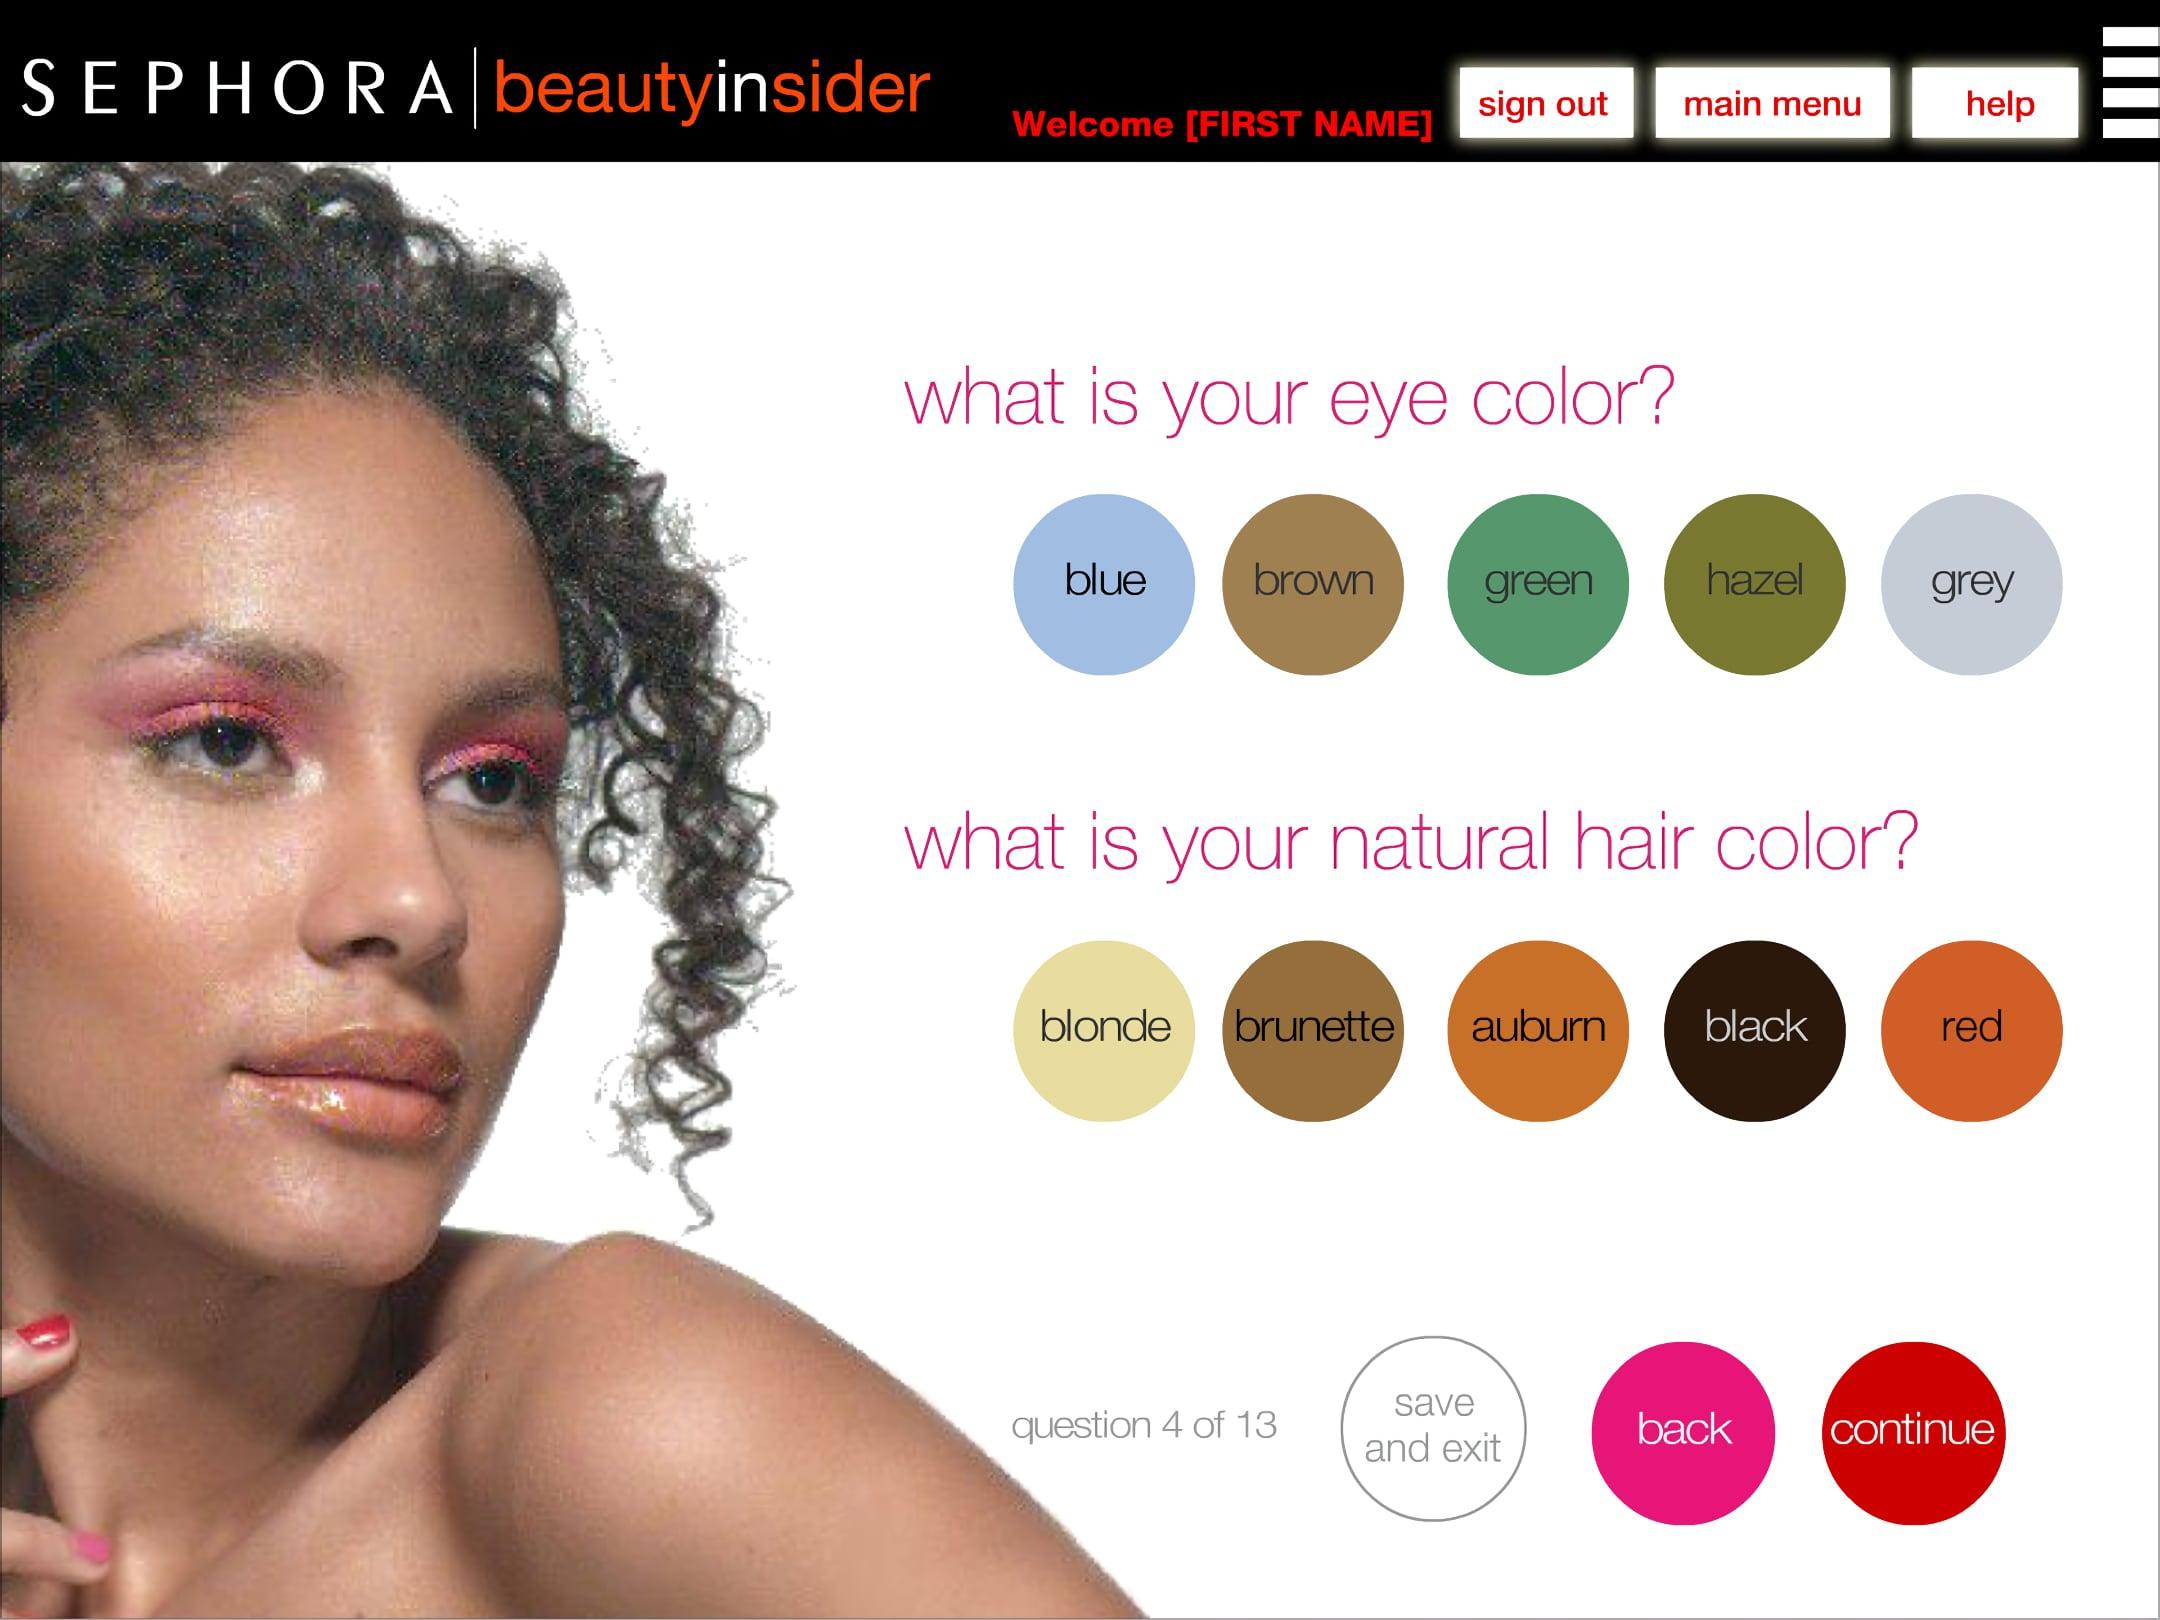 Sephora BI eye and hair color selector